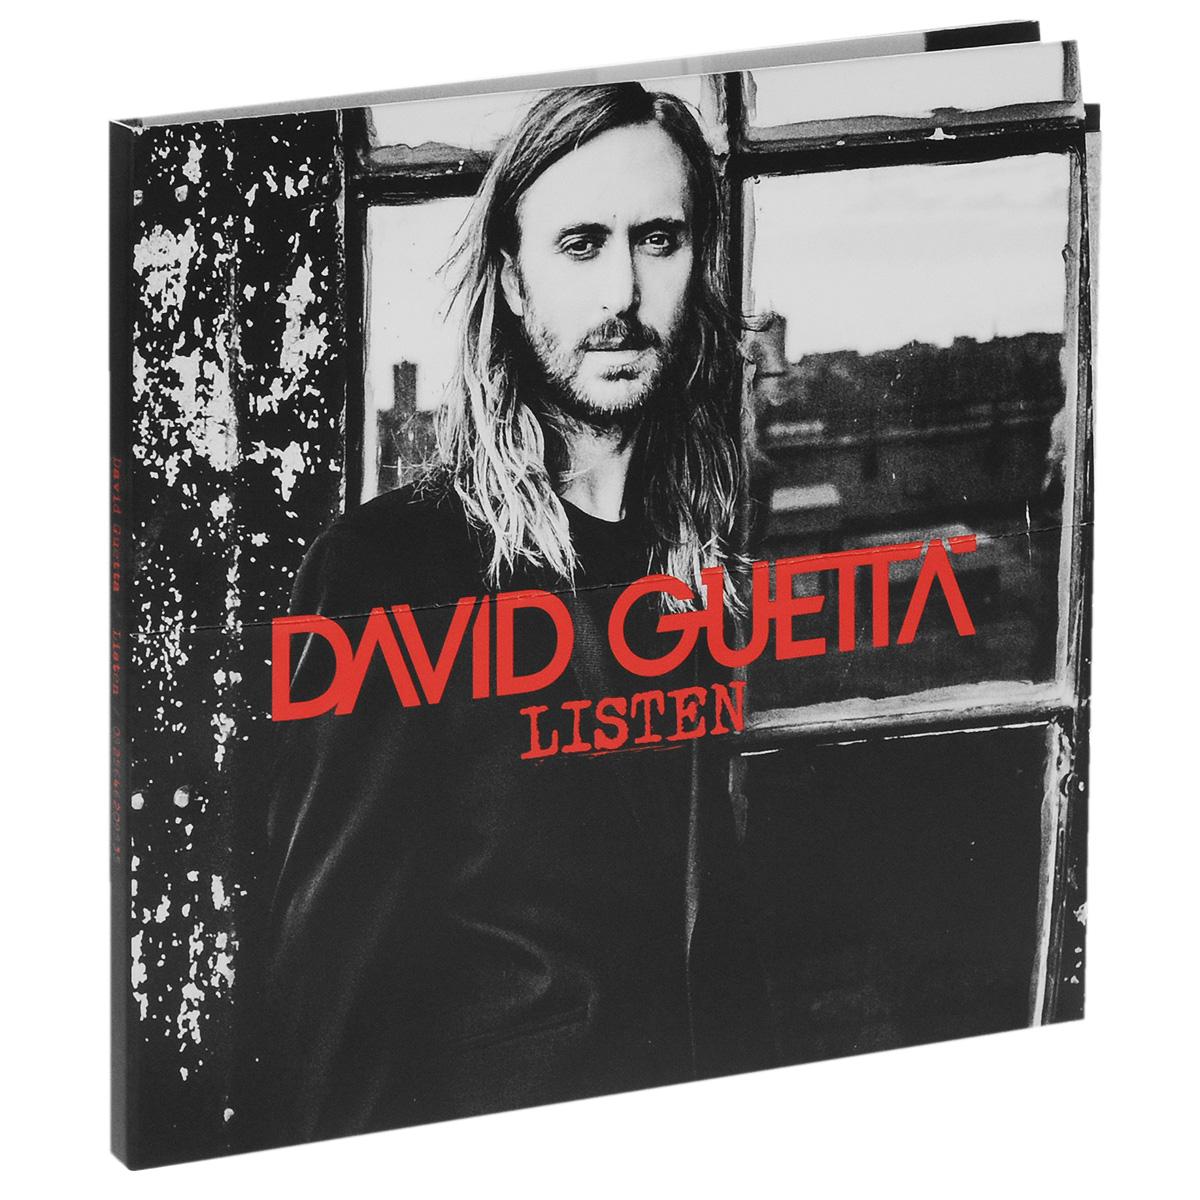 David Guetta. Listen. Limited Edition (2 CD) 2014 2 Audio CD